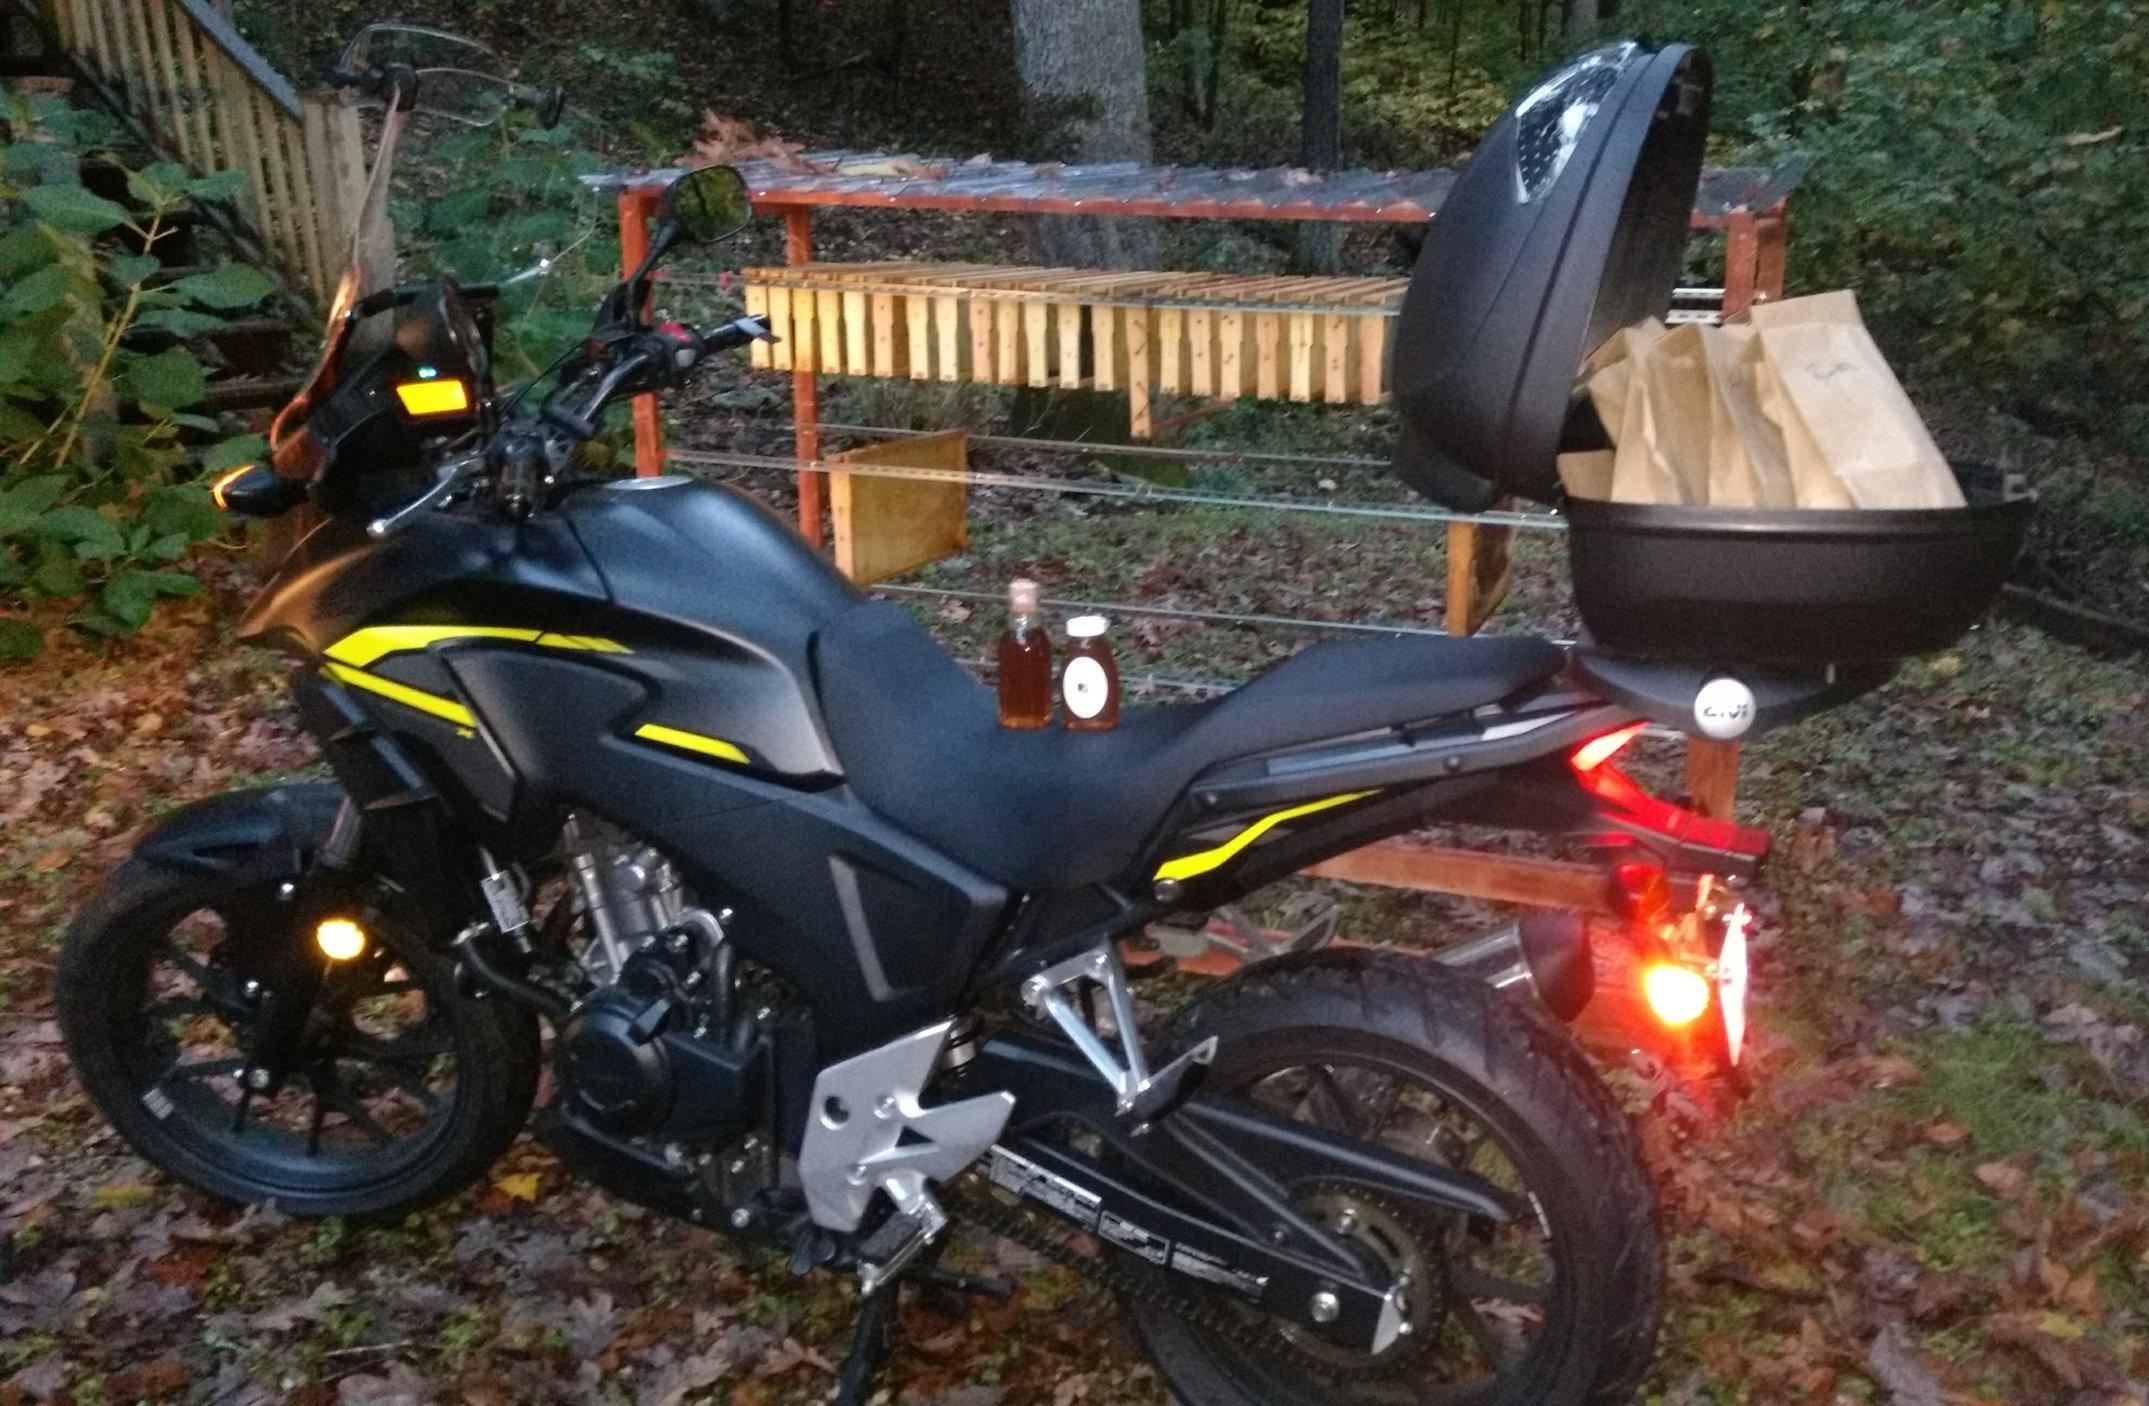 Delivering honey on my Honda CB500X motorcycle